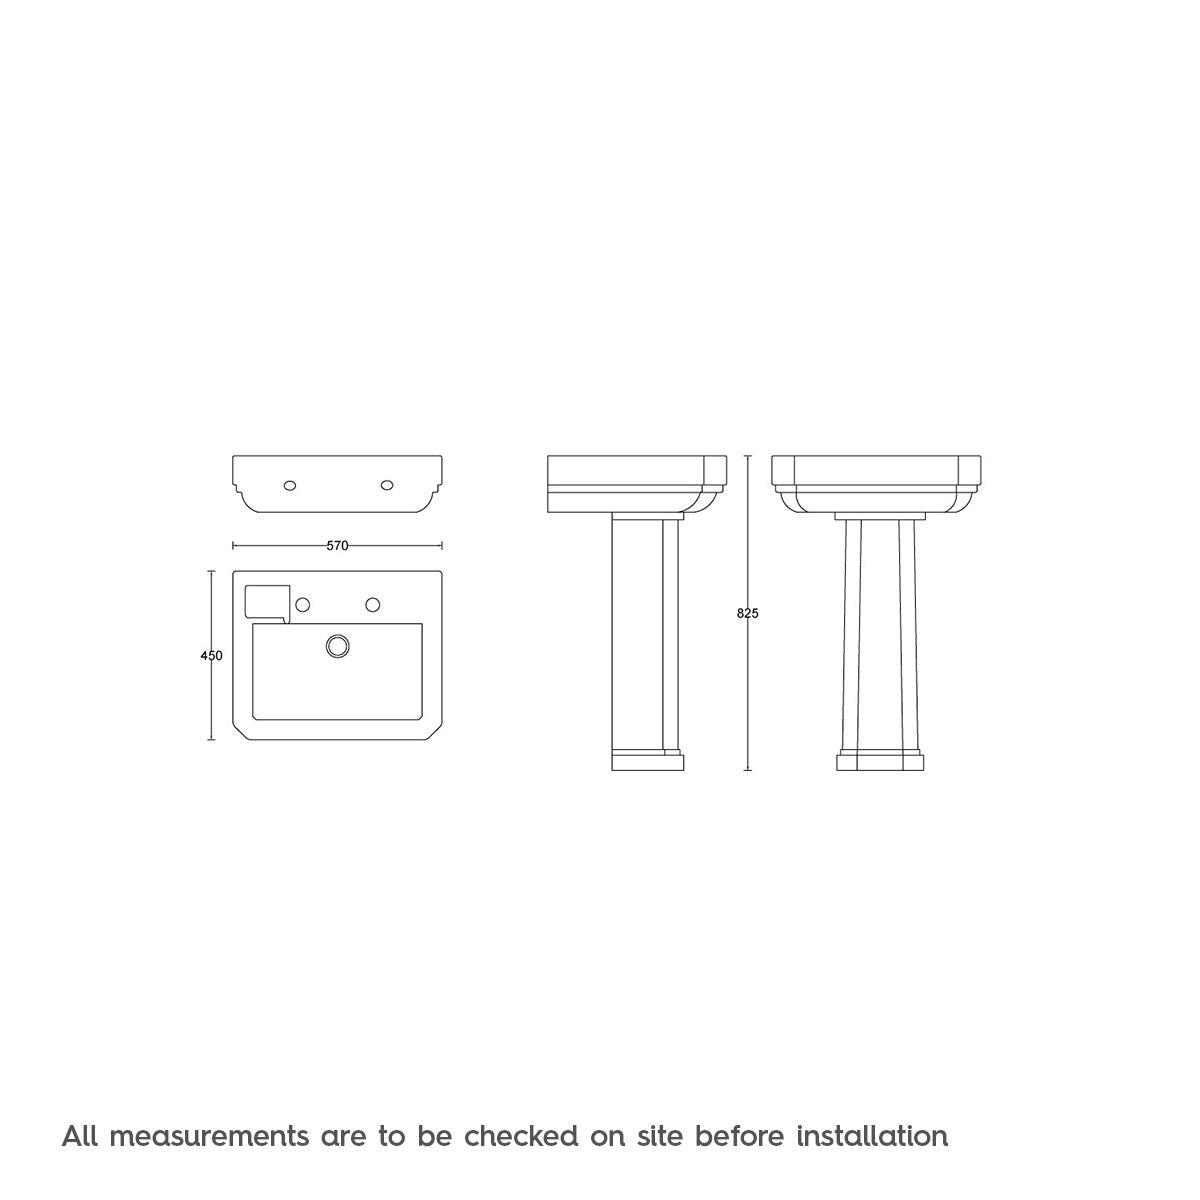 Dimensions for Regency 2 tap hole full pedestal basin 580mm